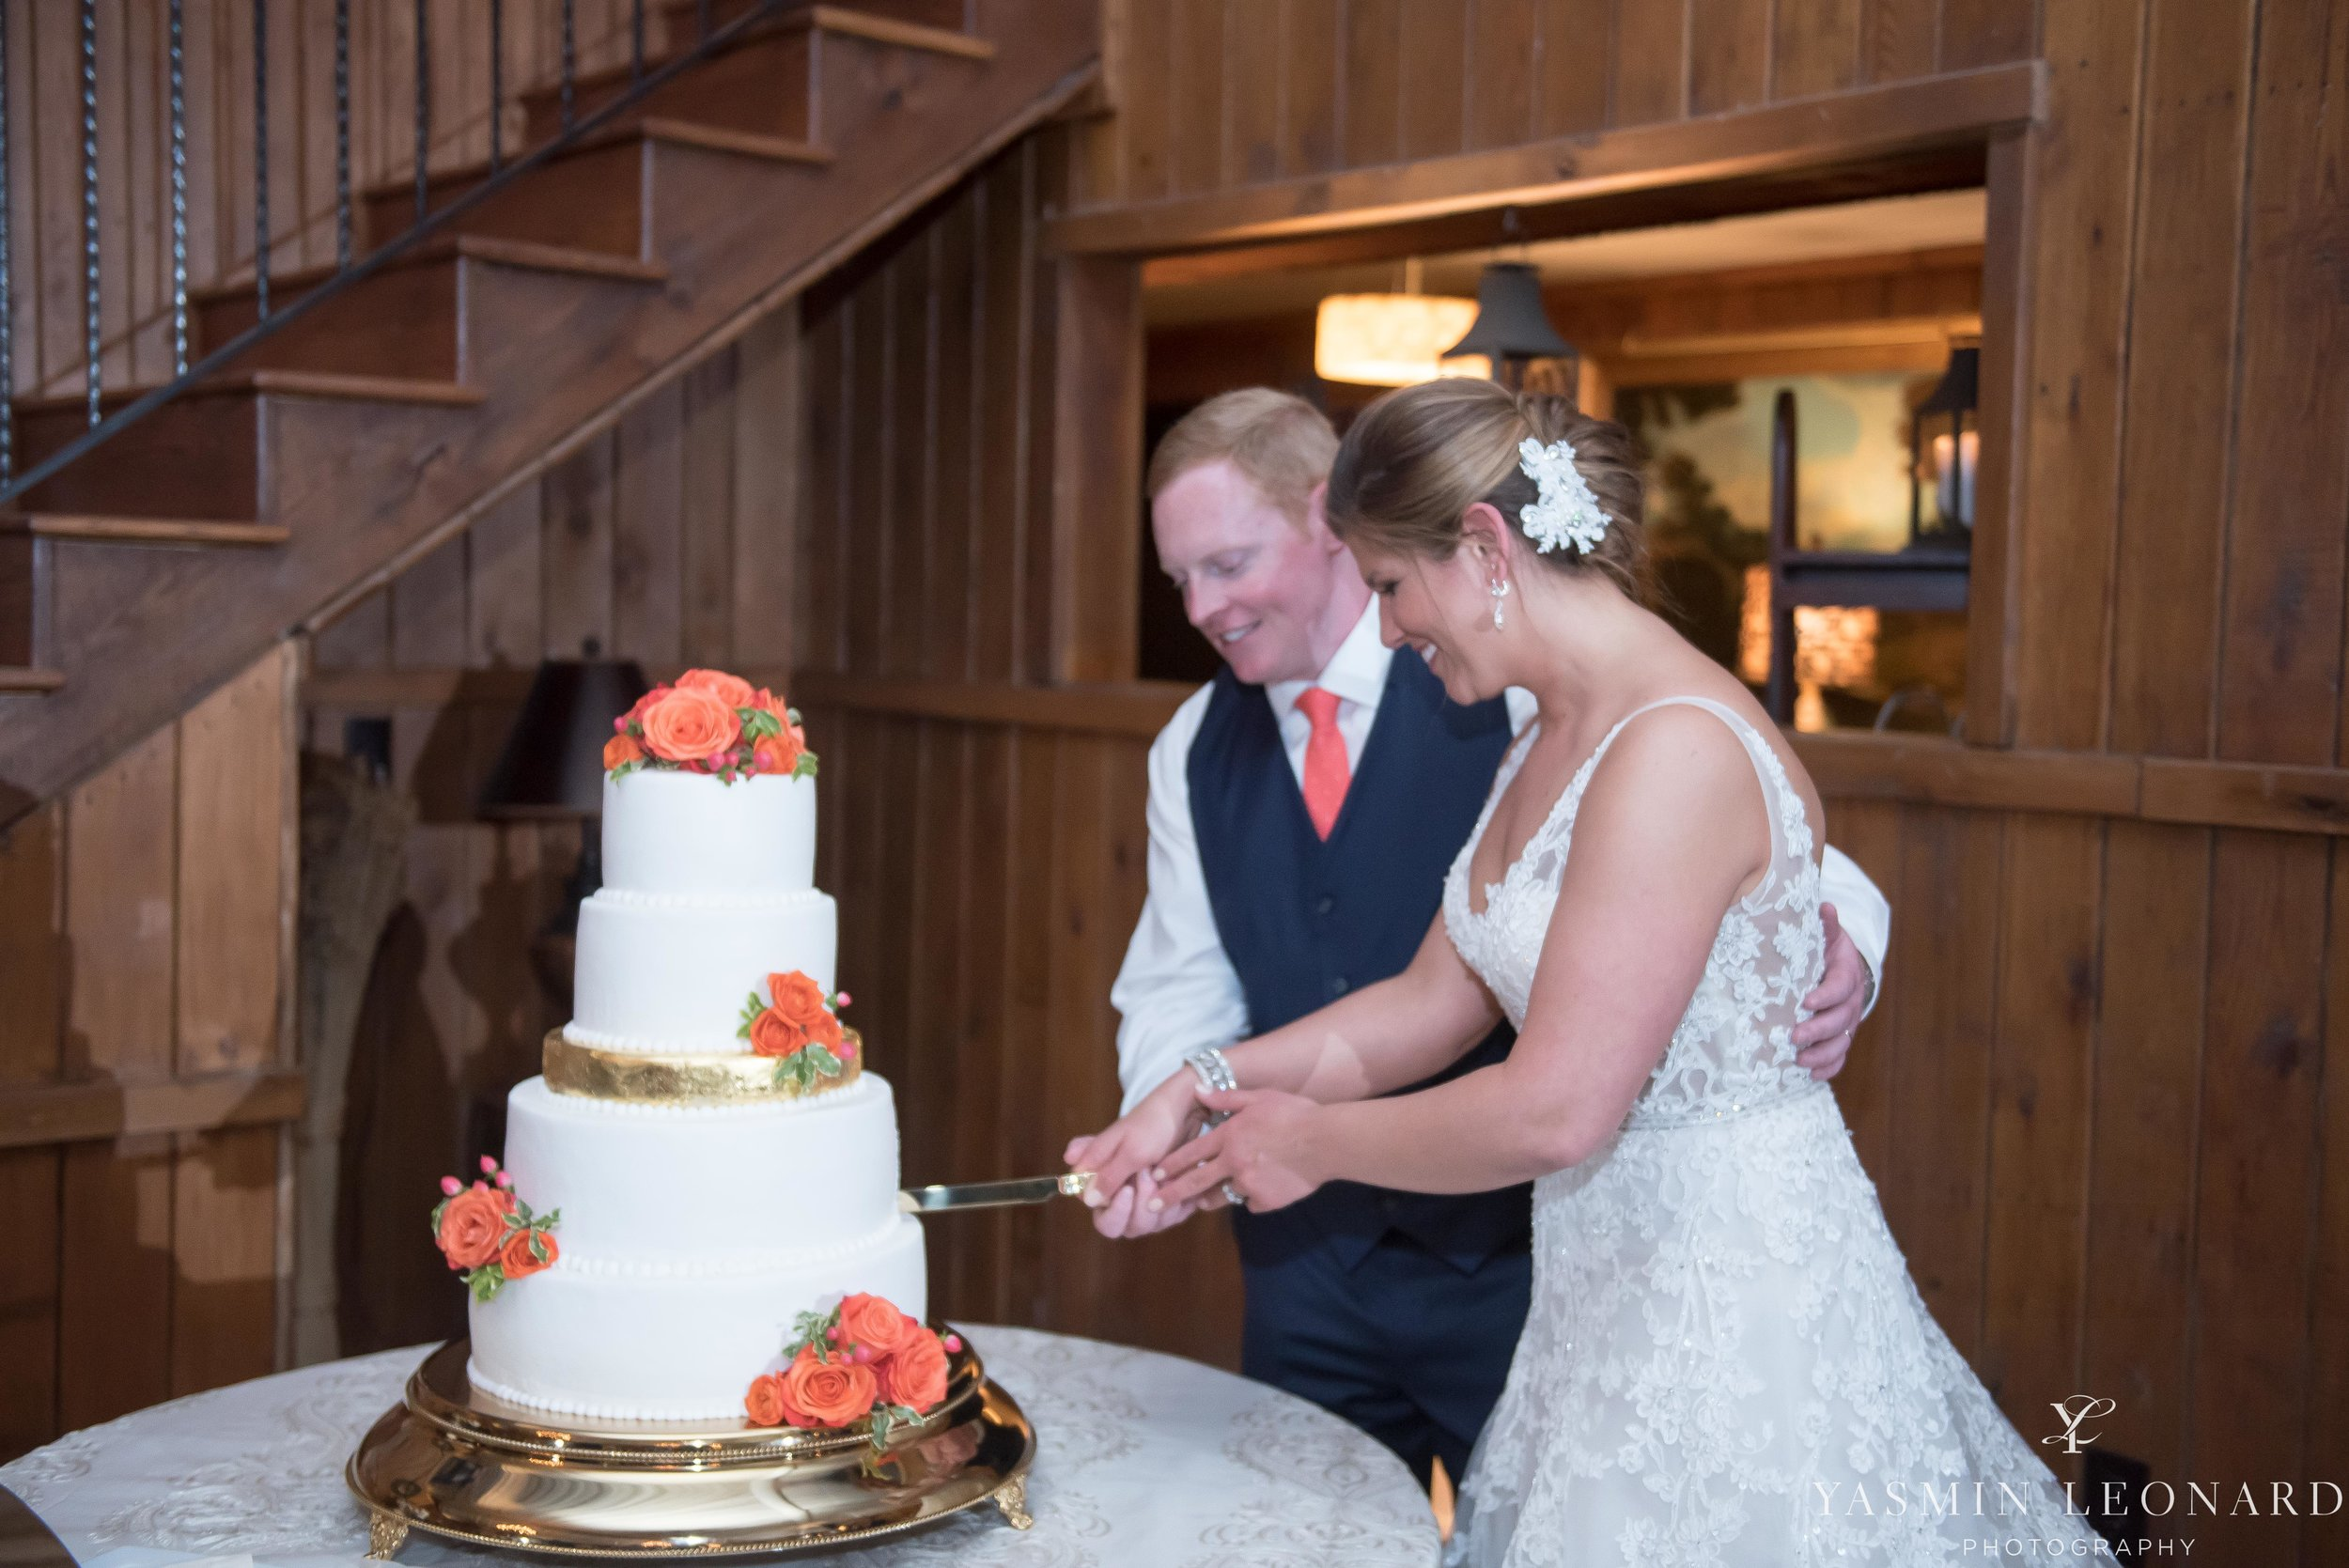 Adaumont Farm - Adaumont Farm Weddings - Trinity Weddings - NC Weddings - Yasmin Leonard Photography-80.jpg